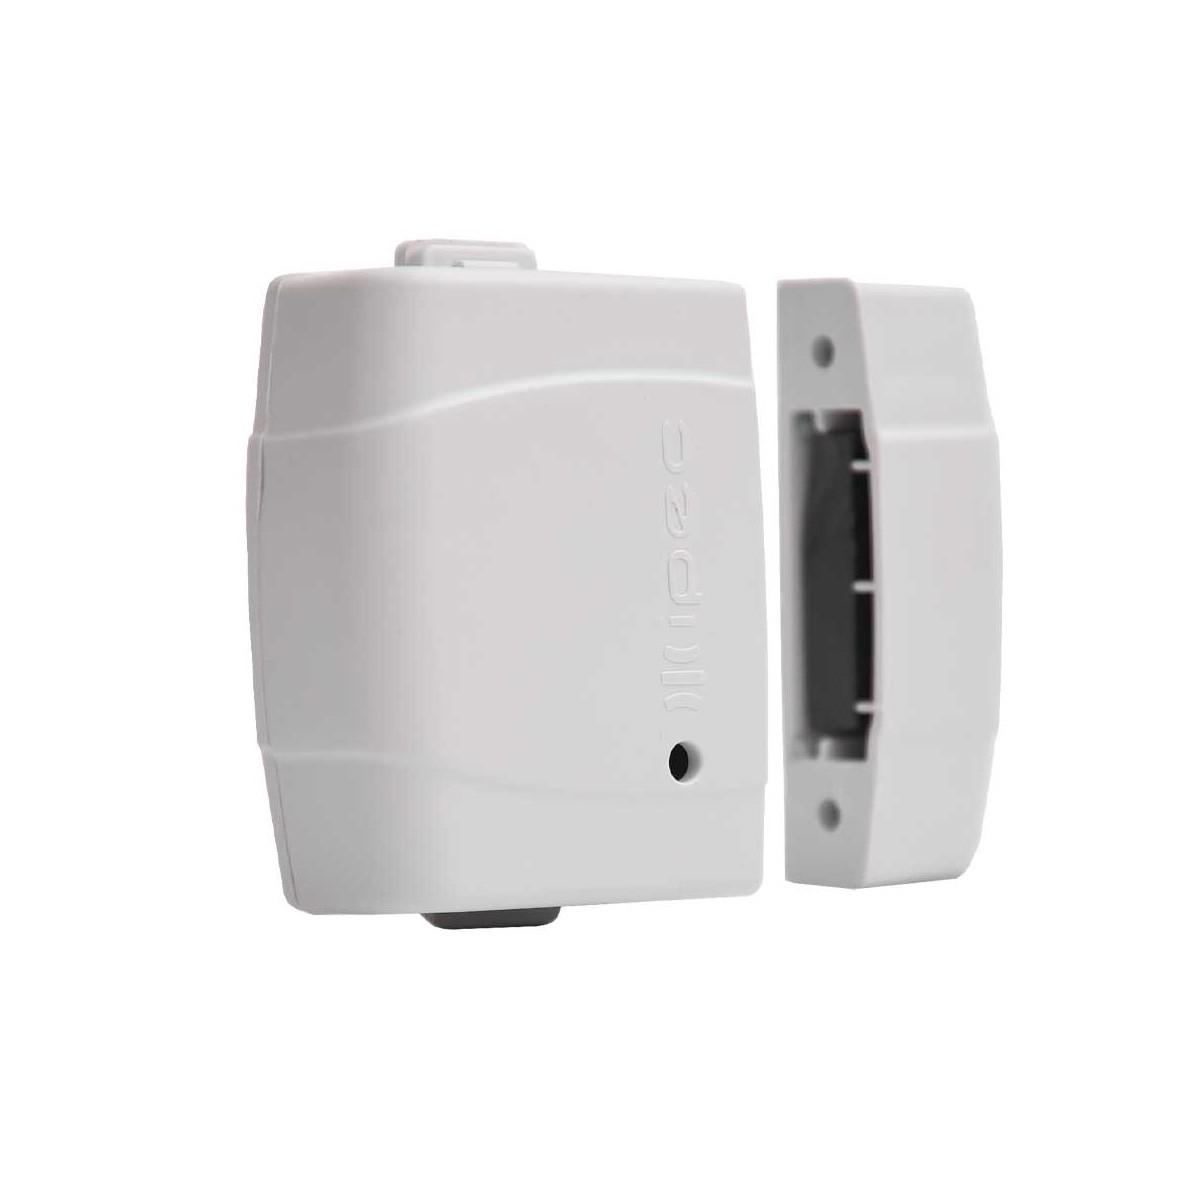 3pcs Sensor Magnético Sem Fio Alarme Residencial Portas Janelas Saw 433,92mhz Ipec